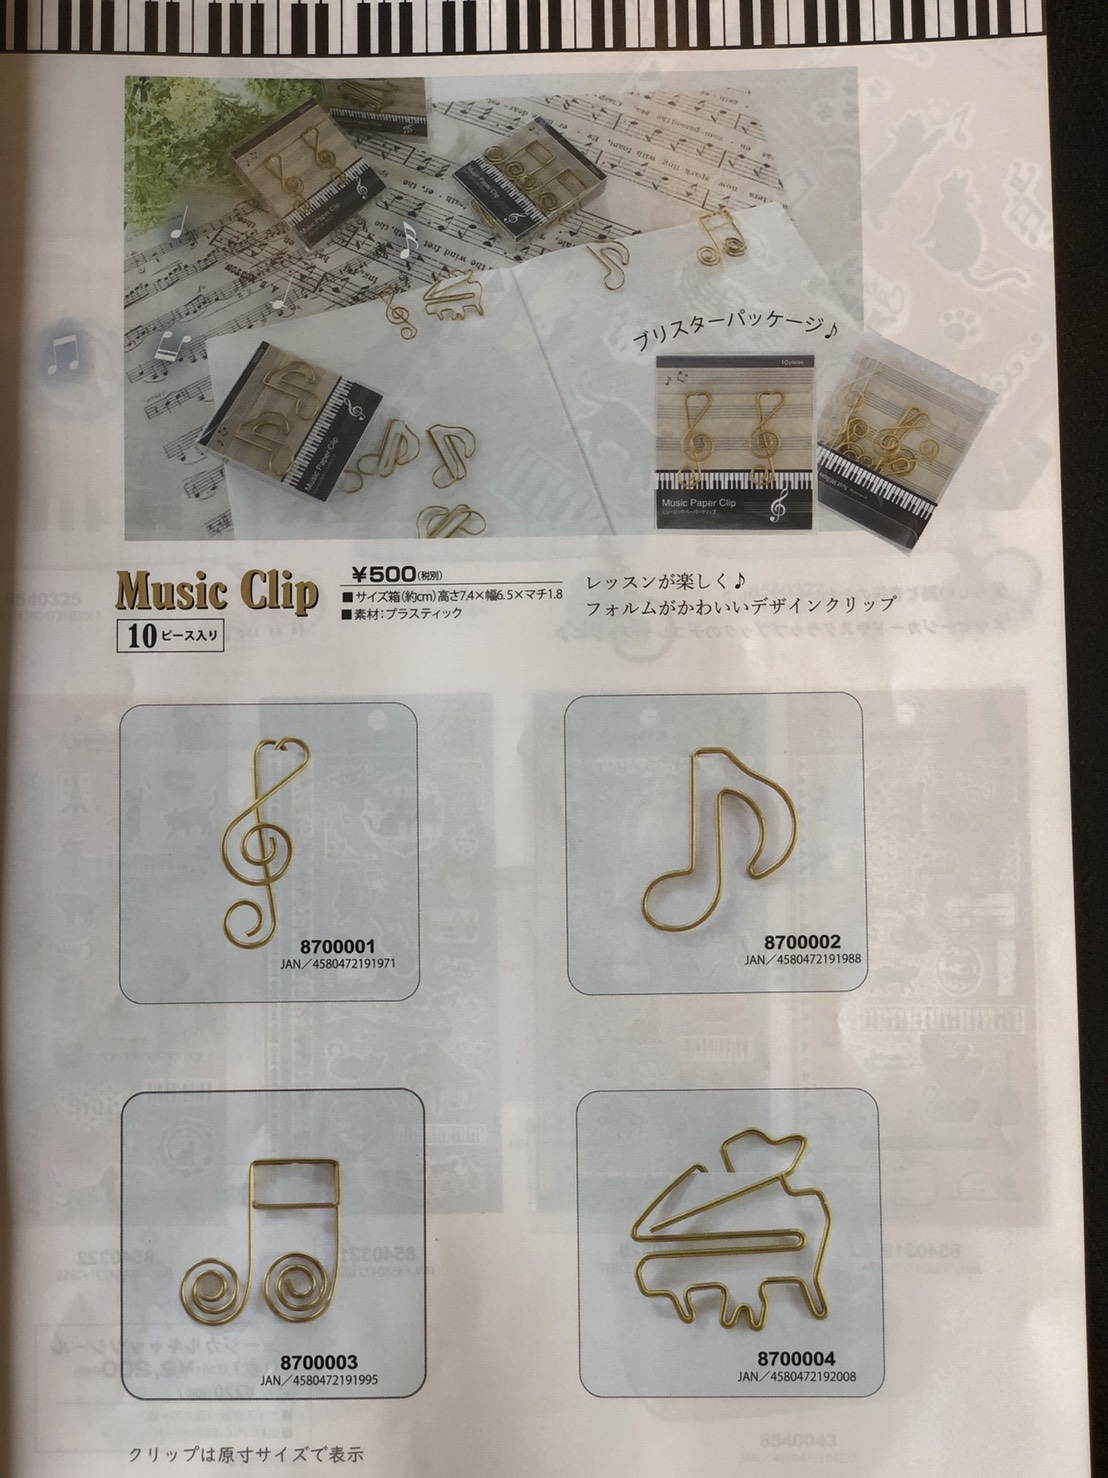 Music Clip♪※在庫有りと書いてあっても、お取り寄せ商品は受注後にメーカー注文になります。※☆【音符・小物グッズ-音楽雑貨】【音楽雑貨】  音楽グッズ  <br>バレエ発表会 記念品 プレゼントに最適 ♪